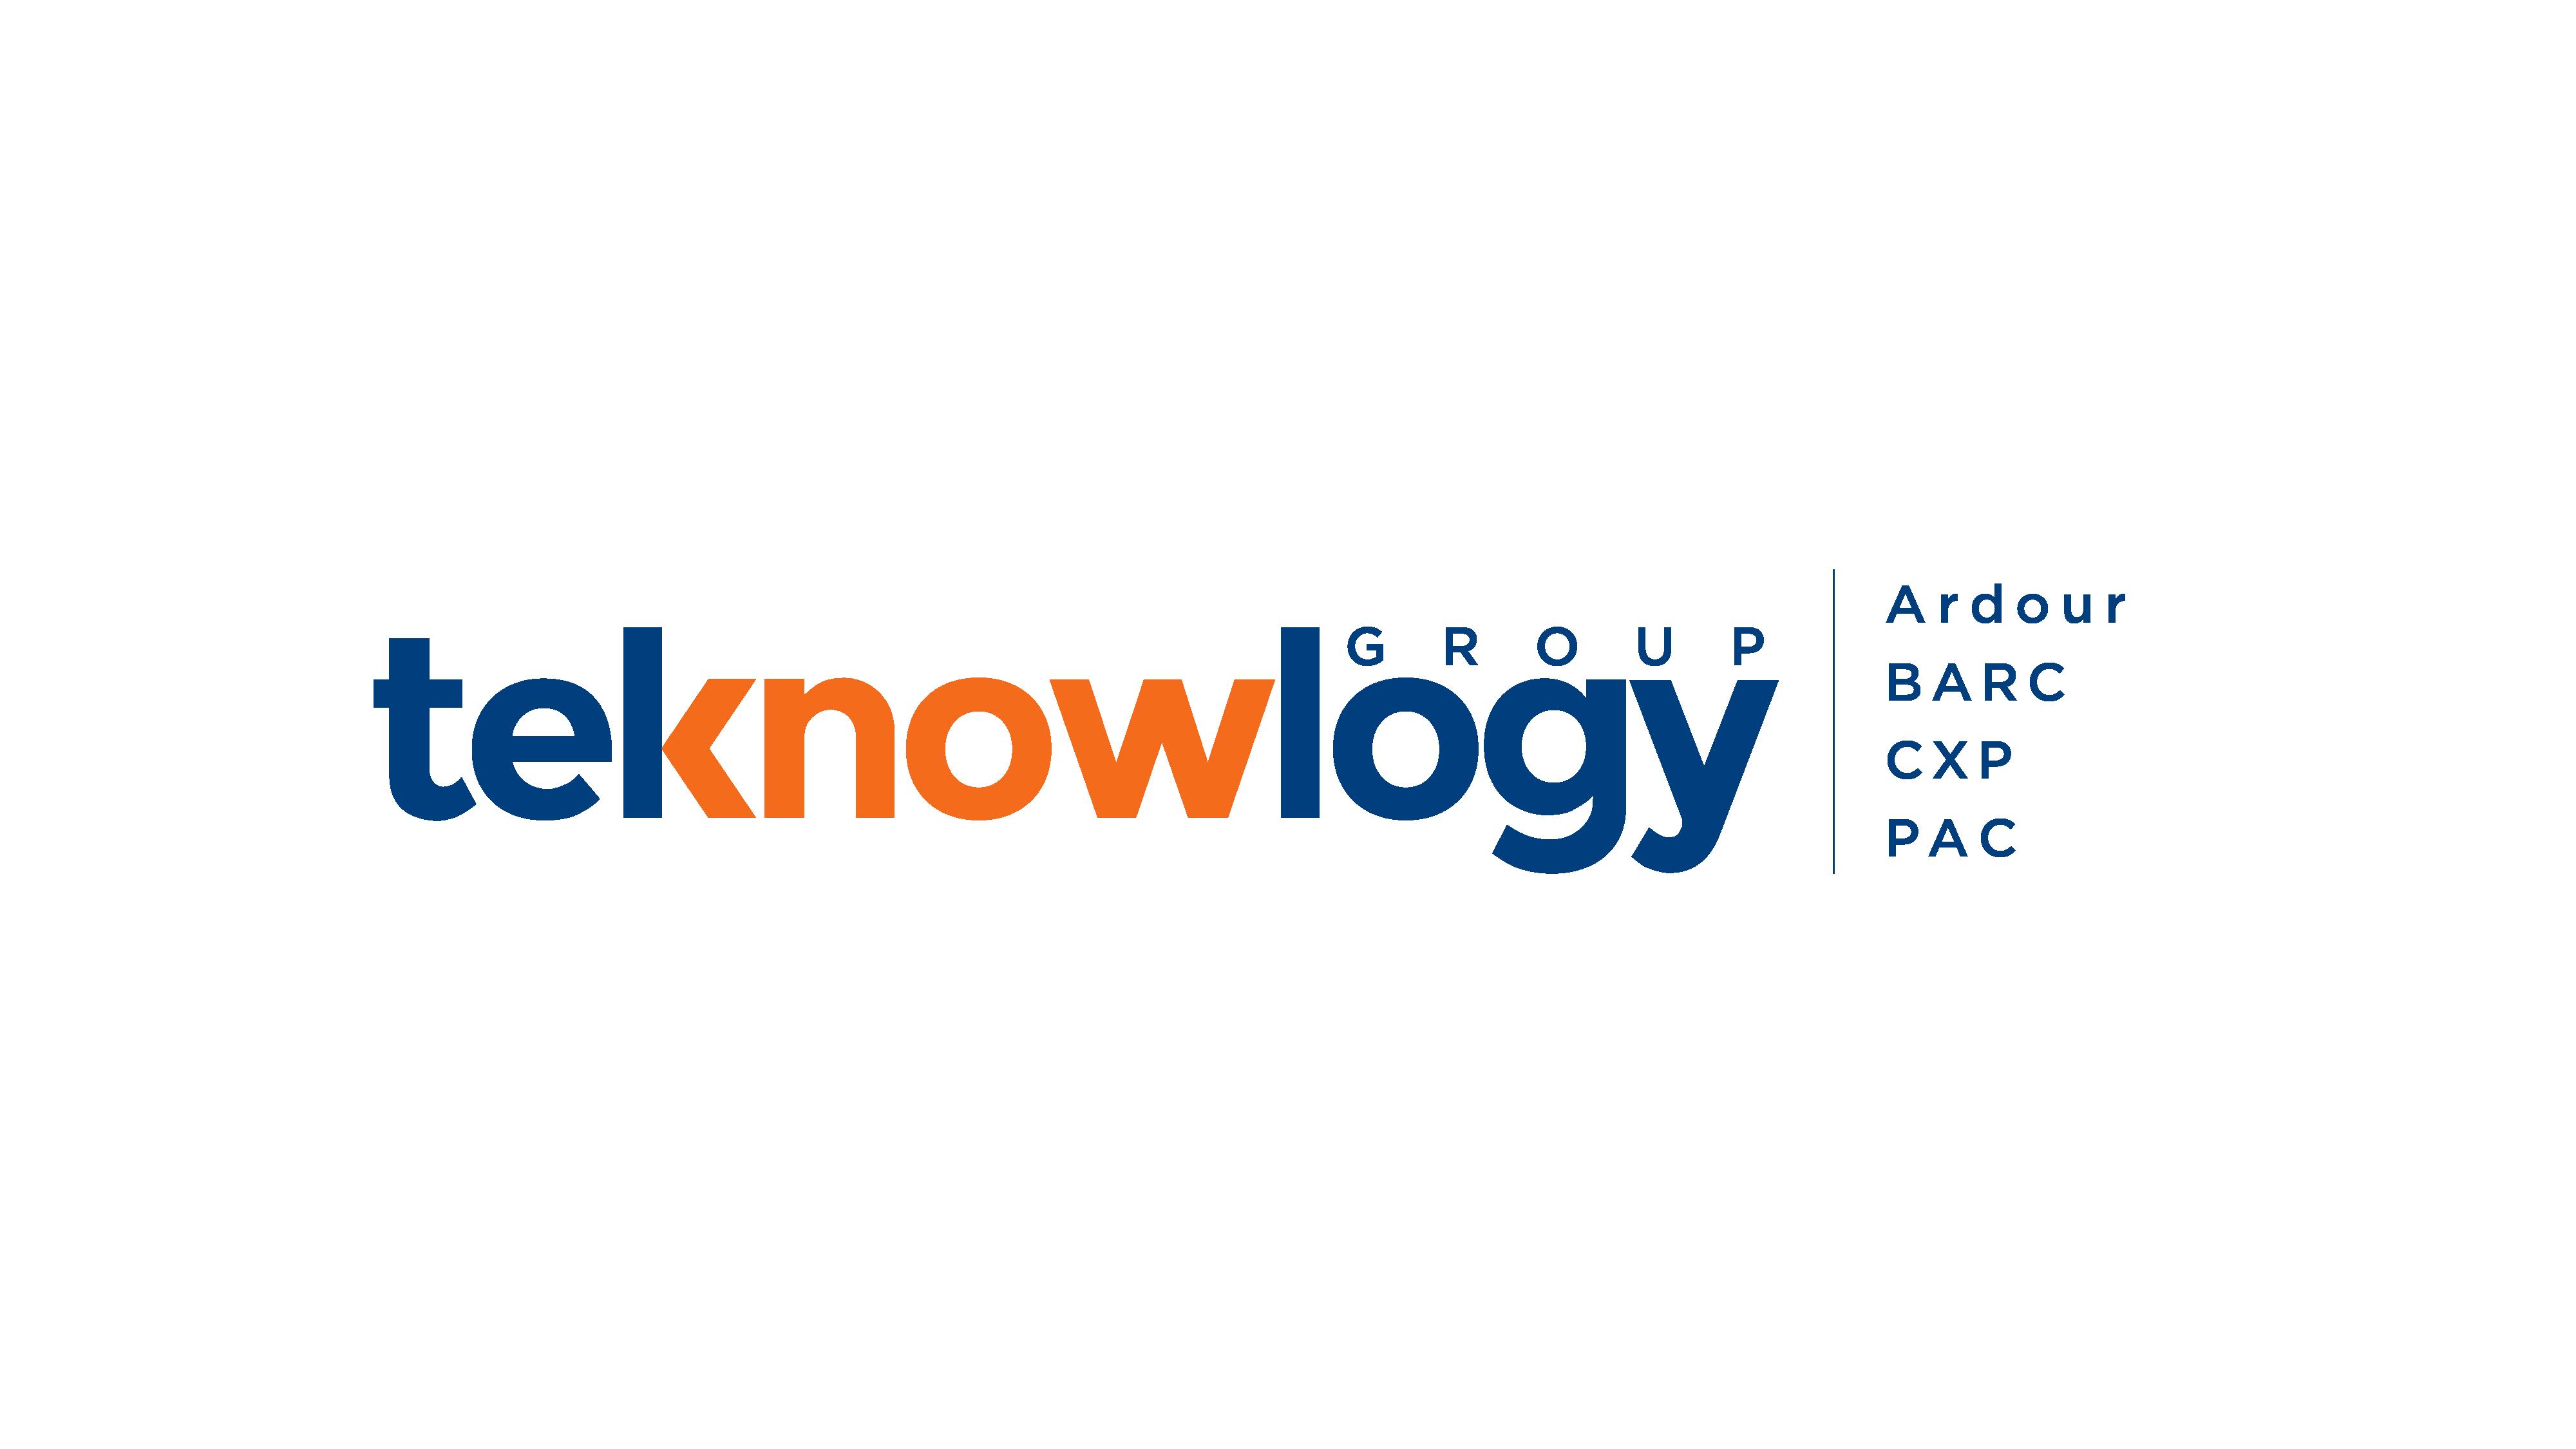 teknowlogy-Group_Logo_Brands